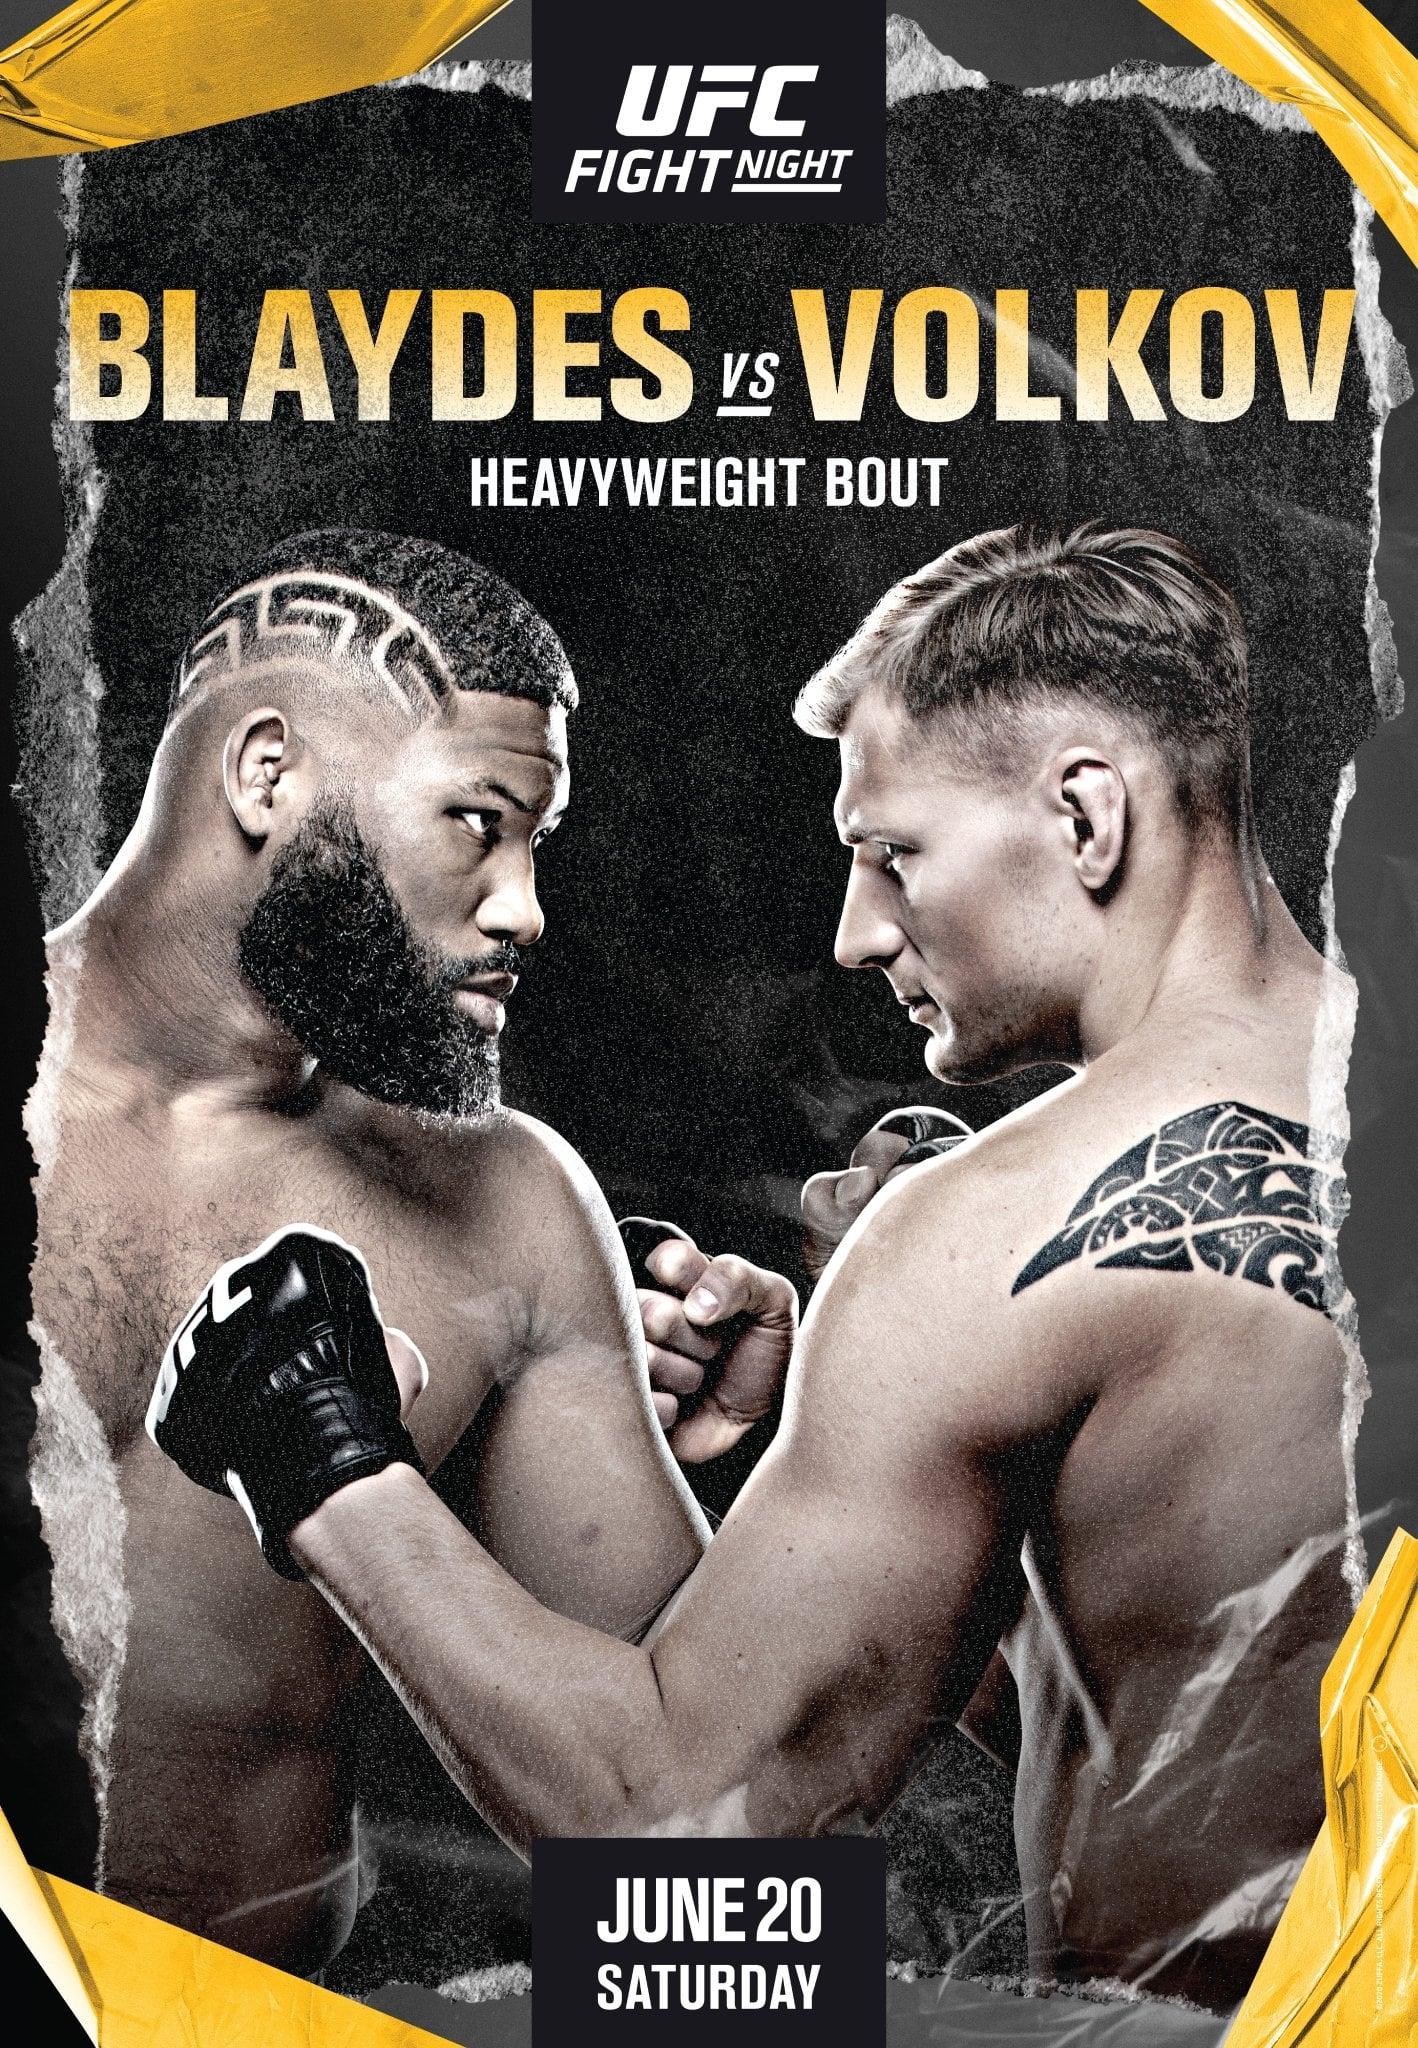 UFC on ESPN 11: Blaydes vs Volkov